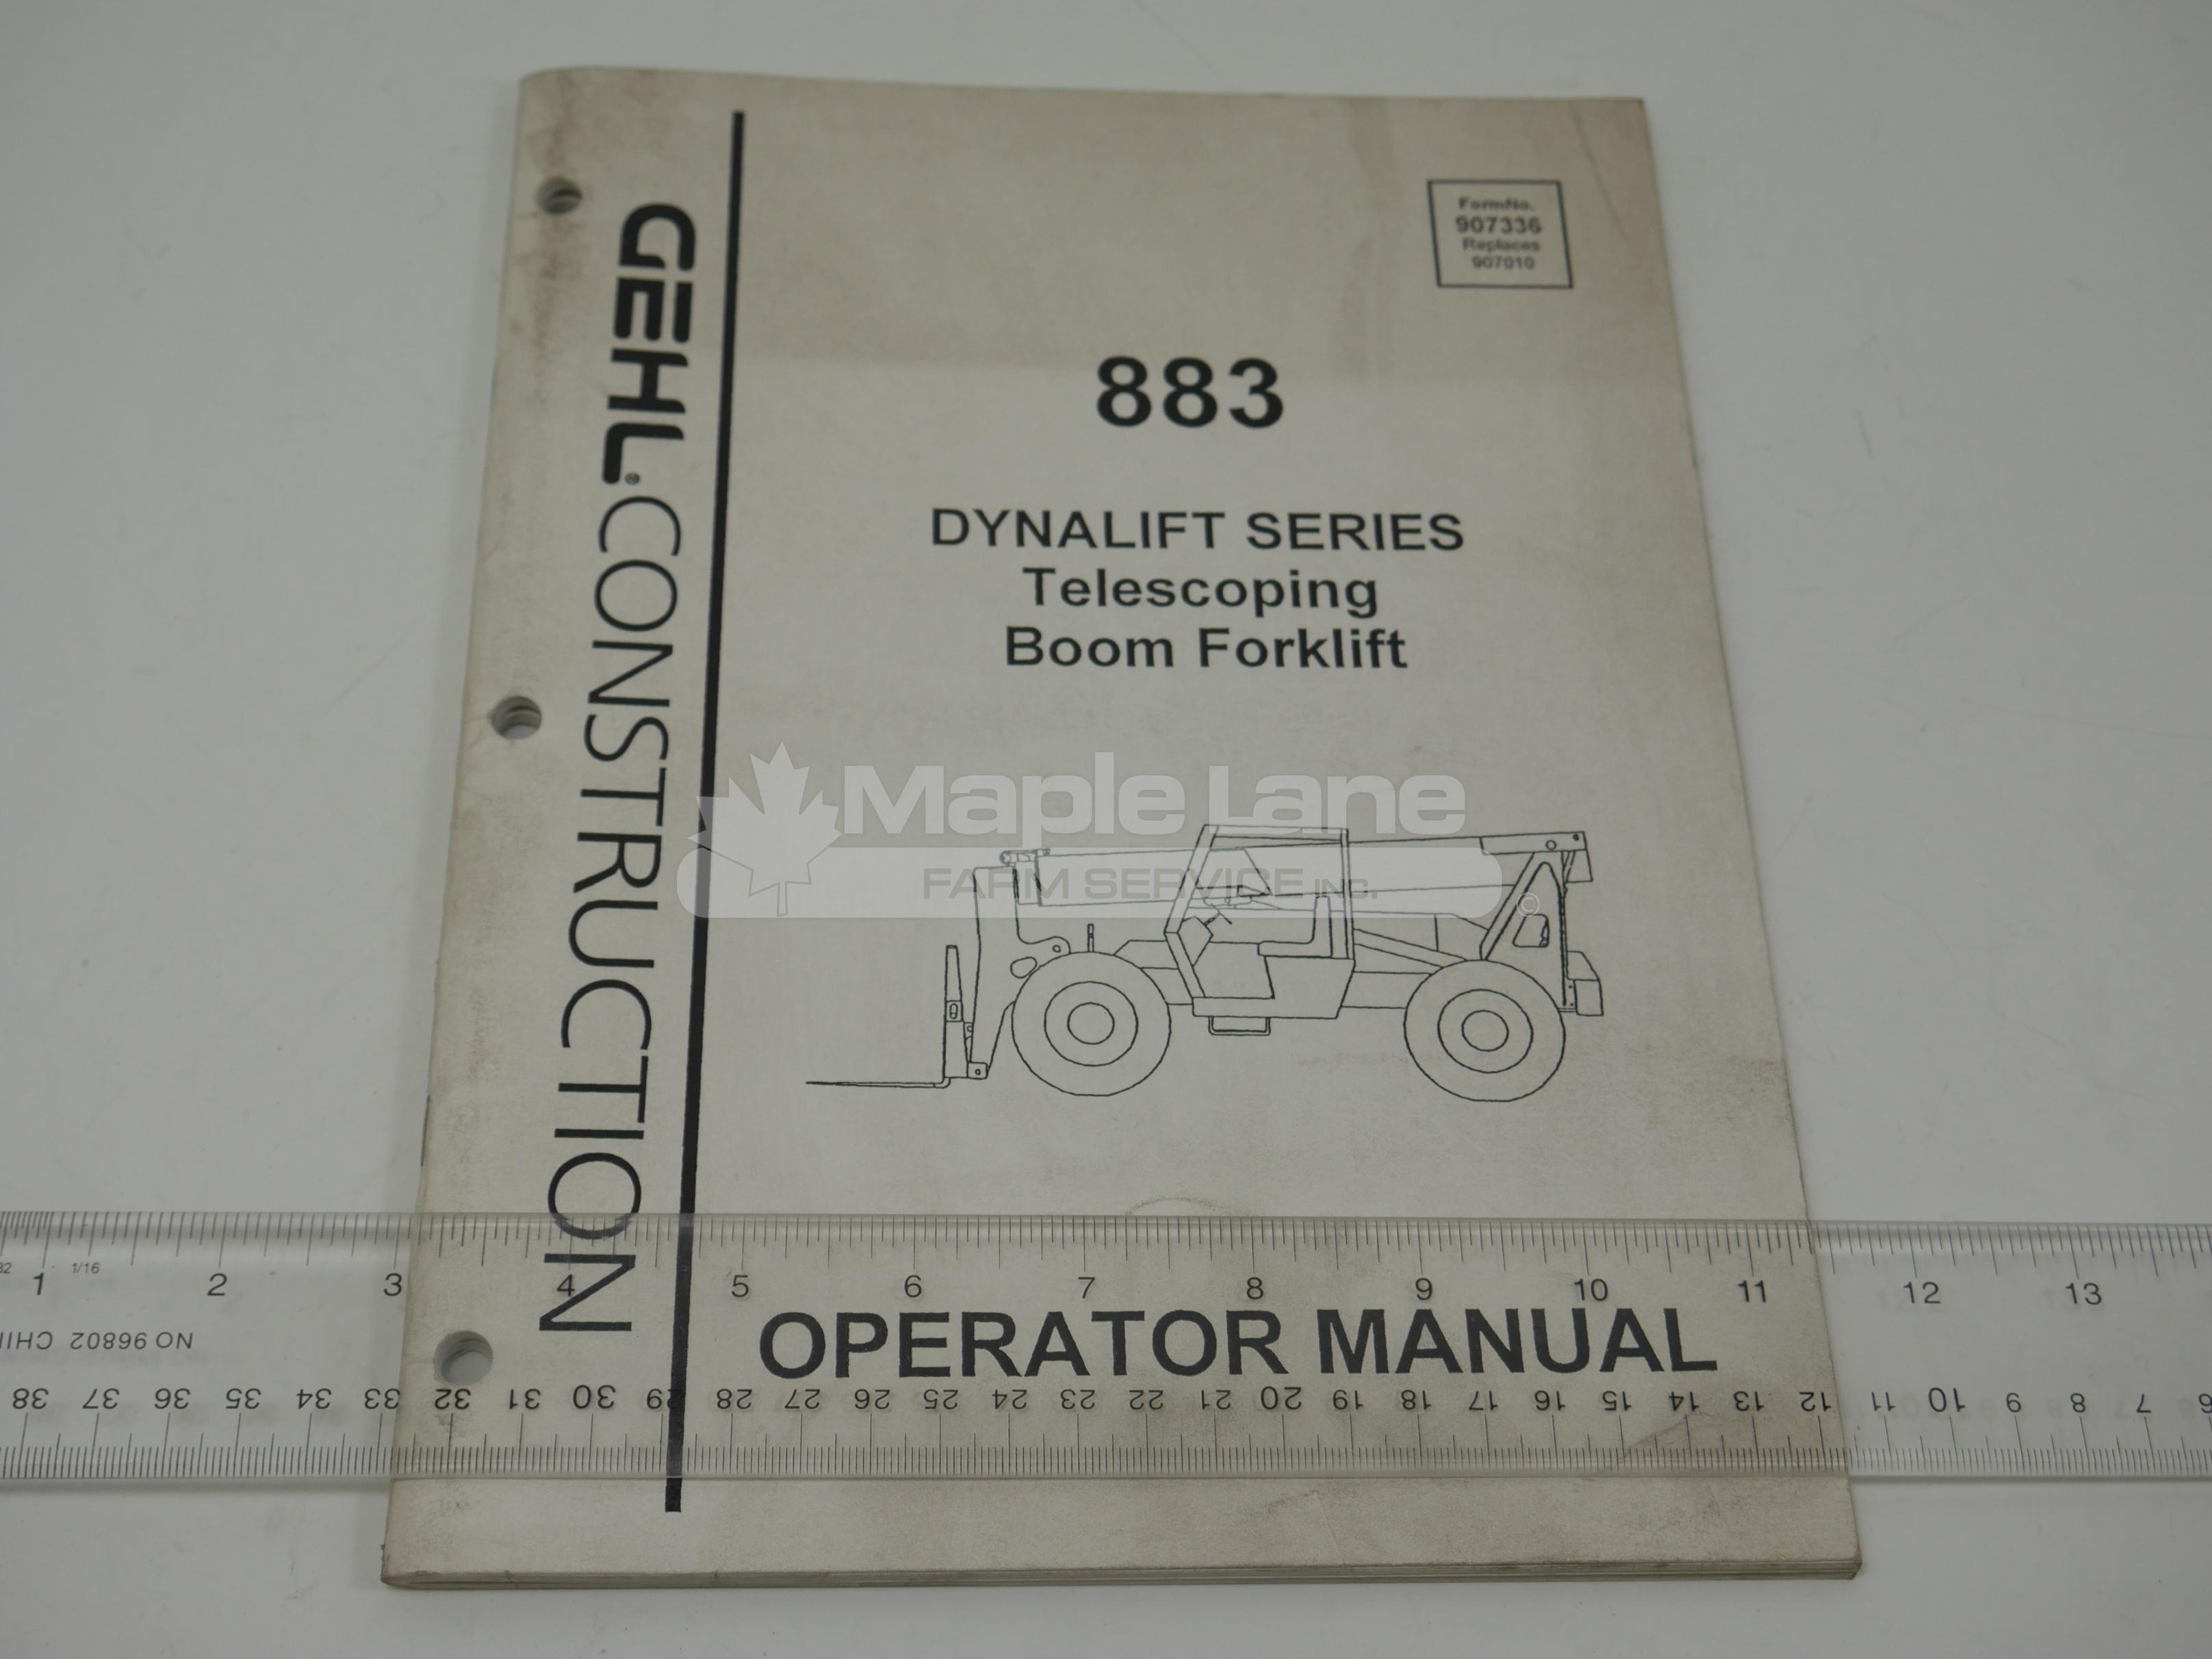 907336 Operator Manual